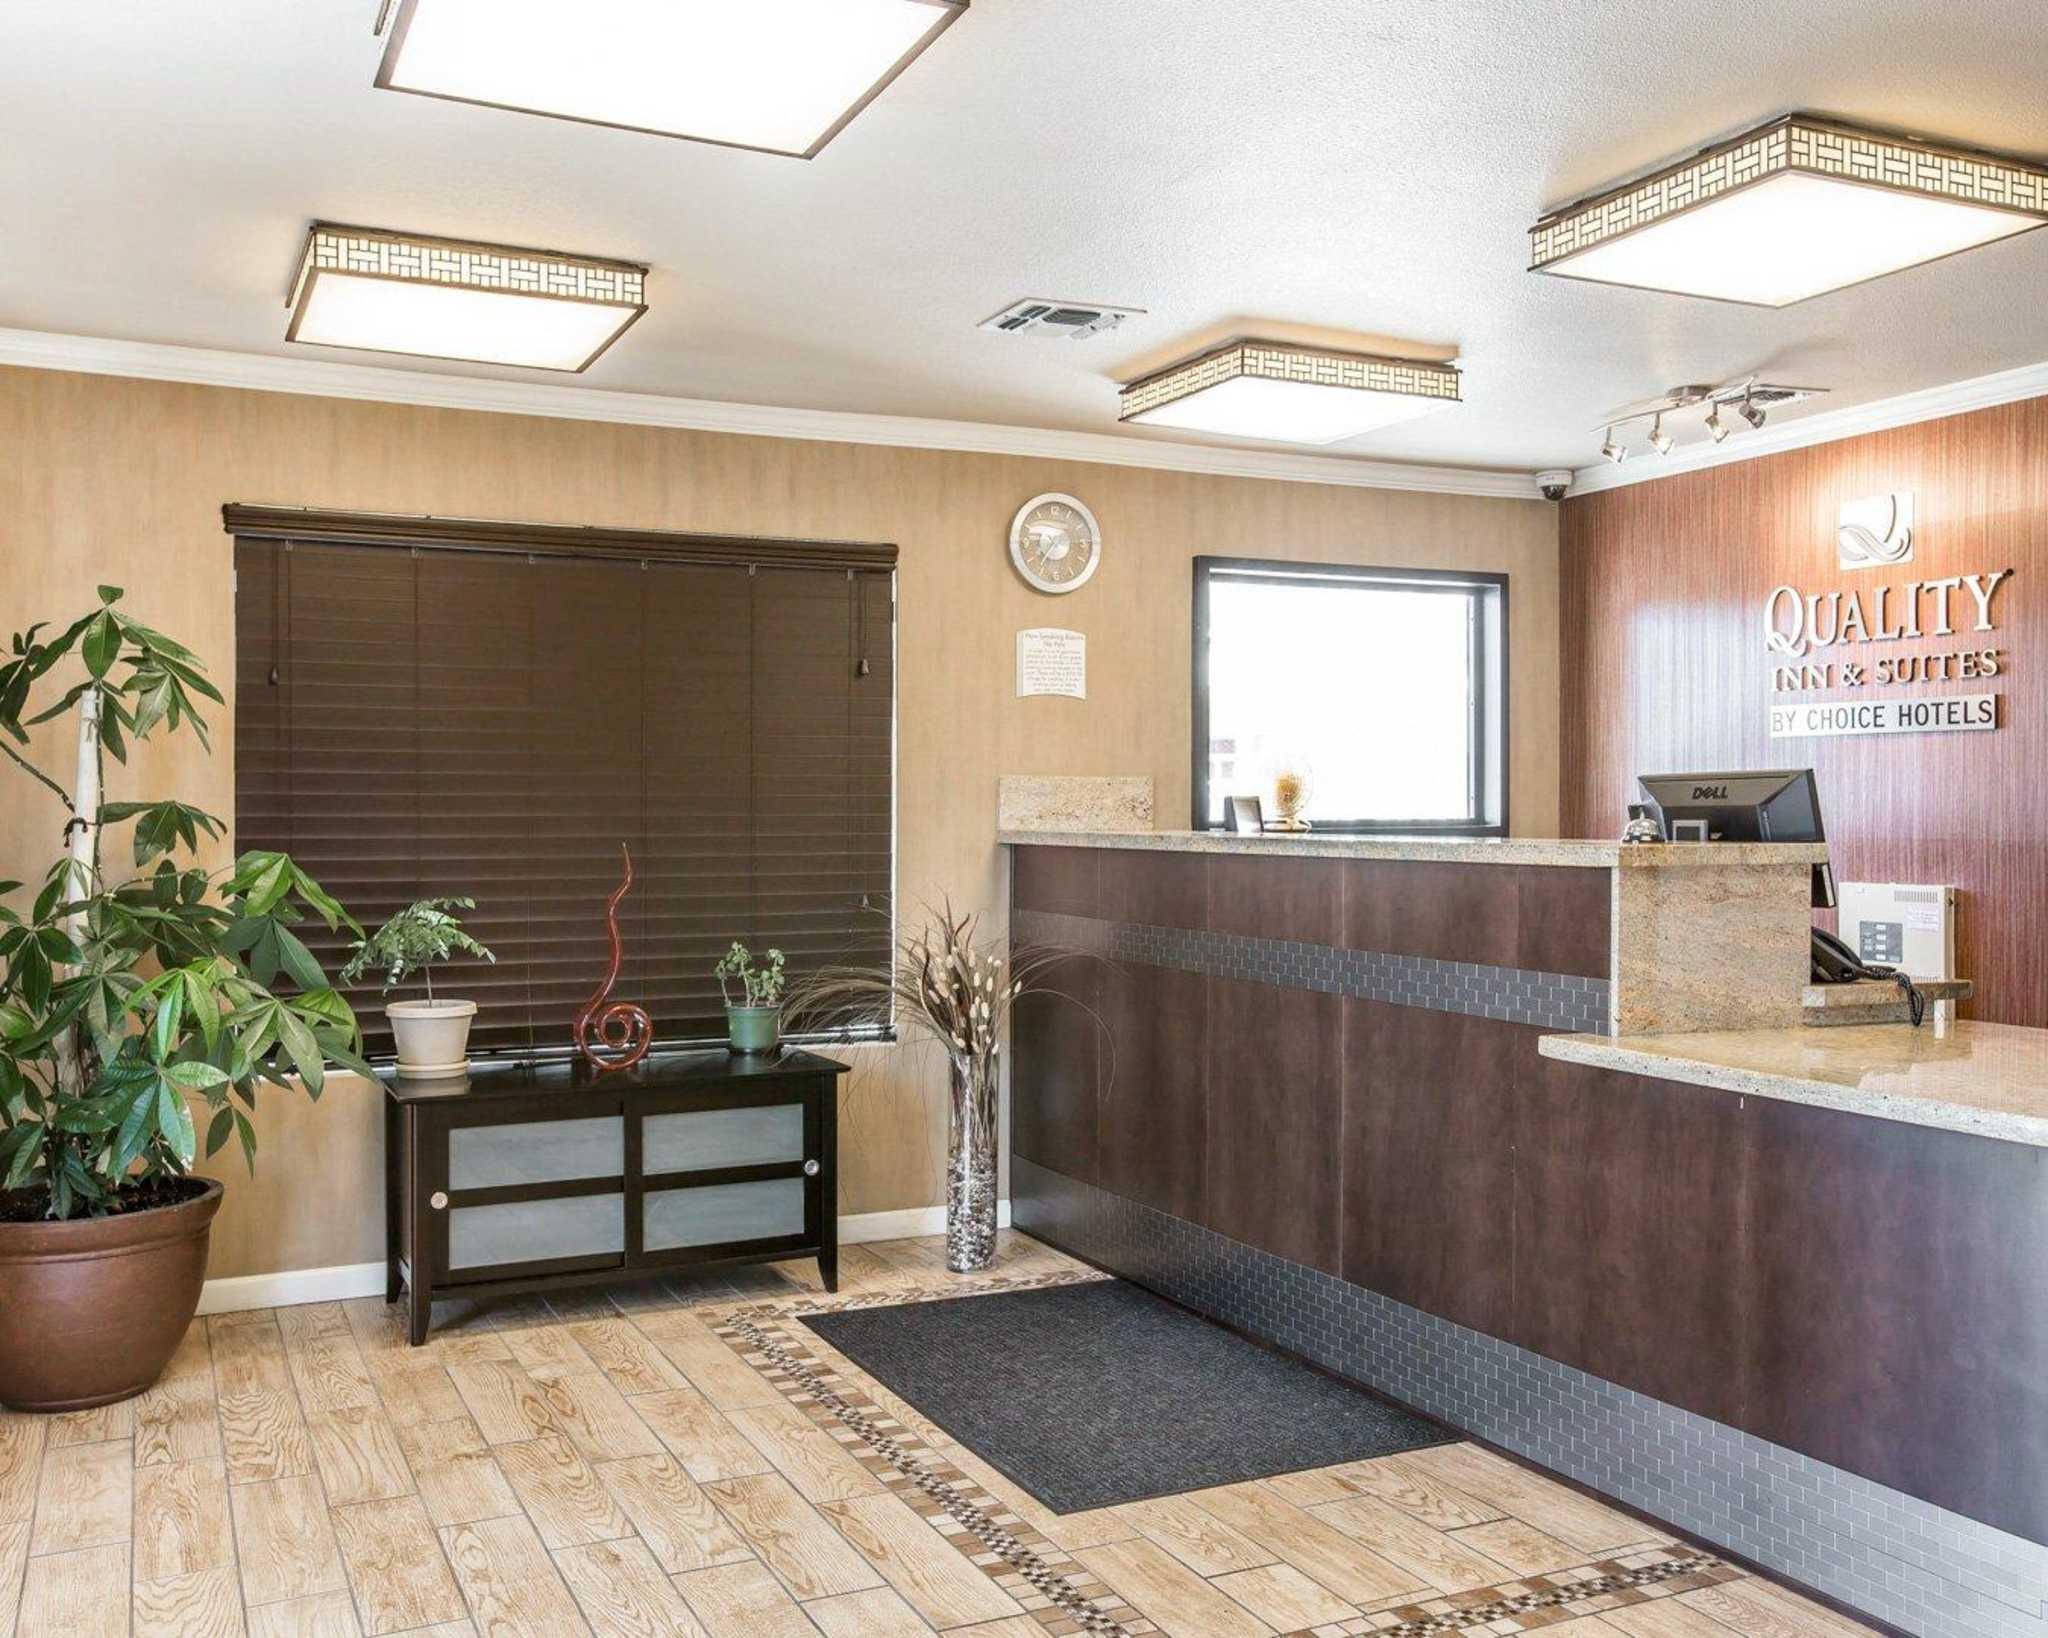 Quality Inn & Suites Woodland - Sacramento Airport image 15